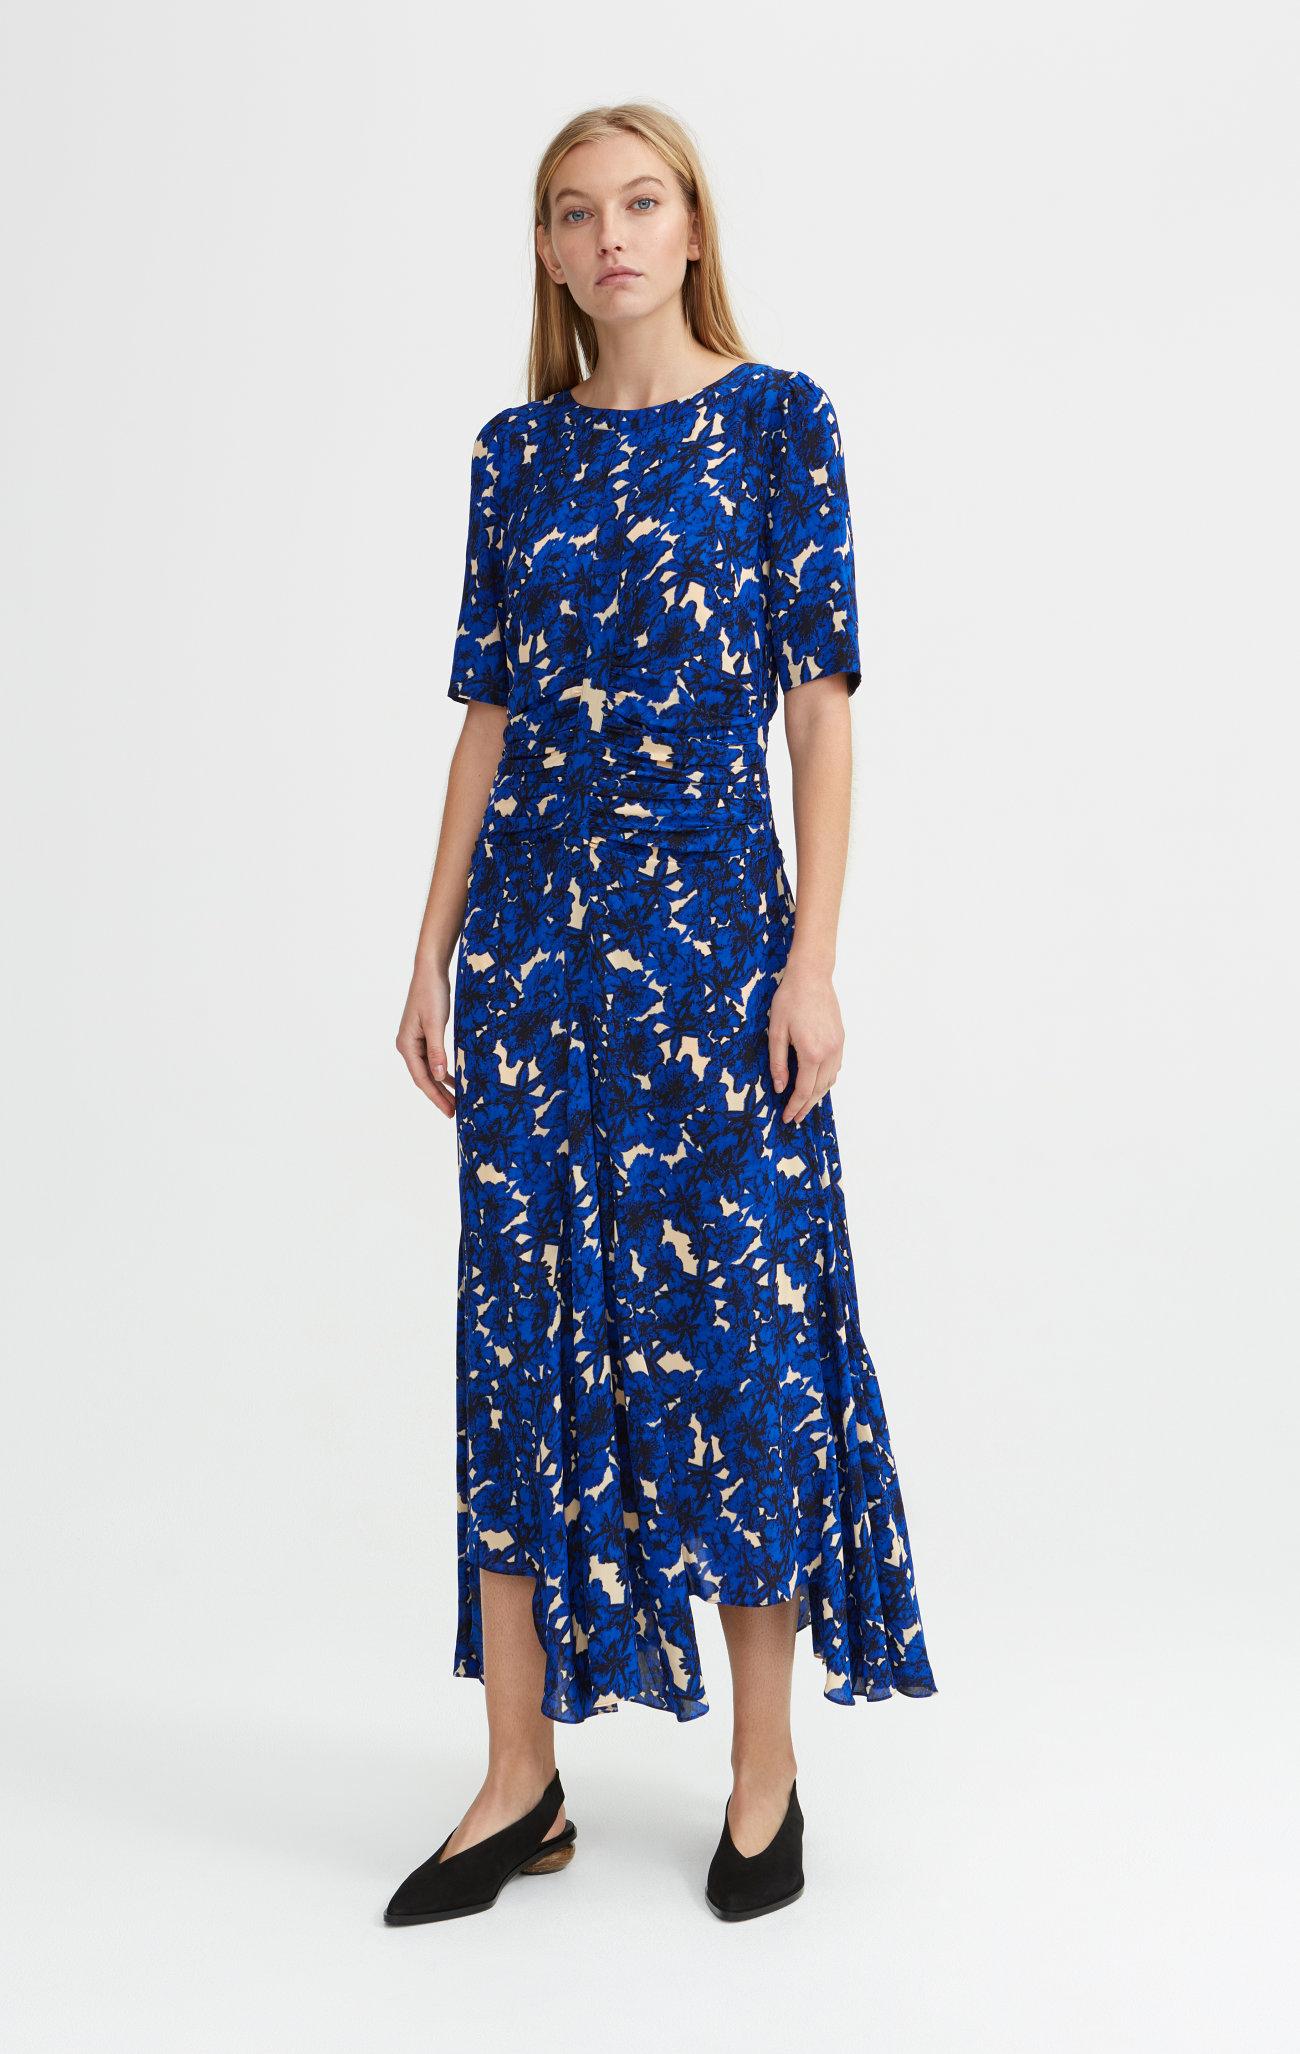 303d44859b9e Rodebjer Zohra dress - Rodebjer